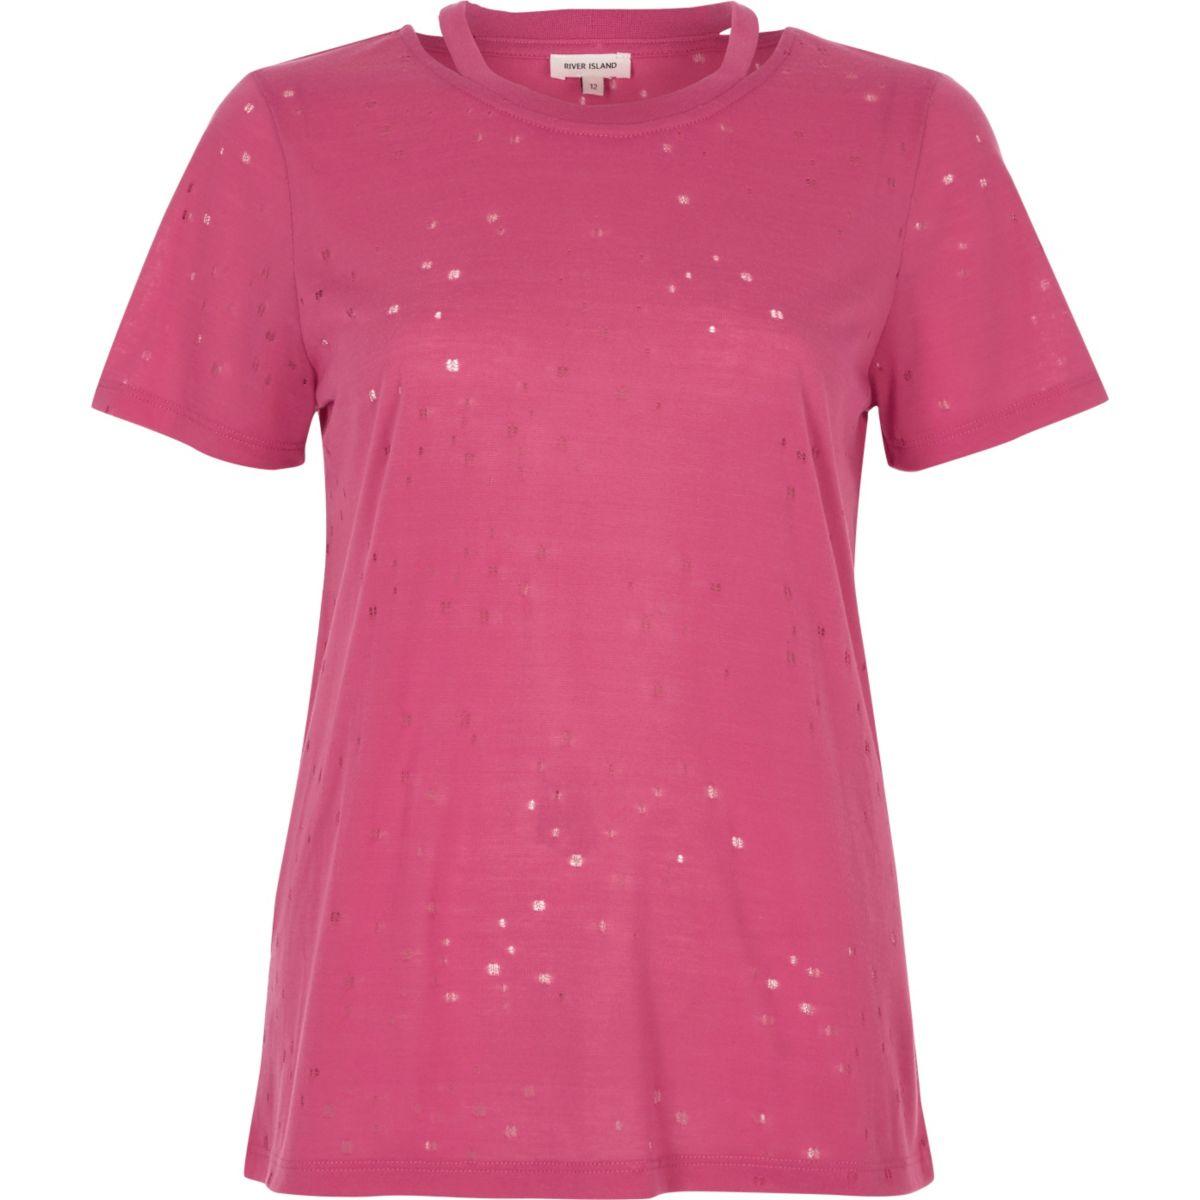 T-shirt rose aspect usé